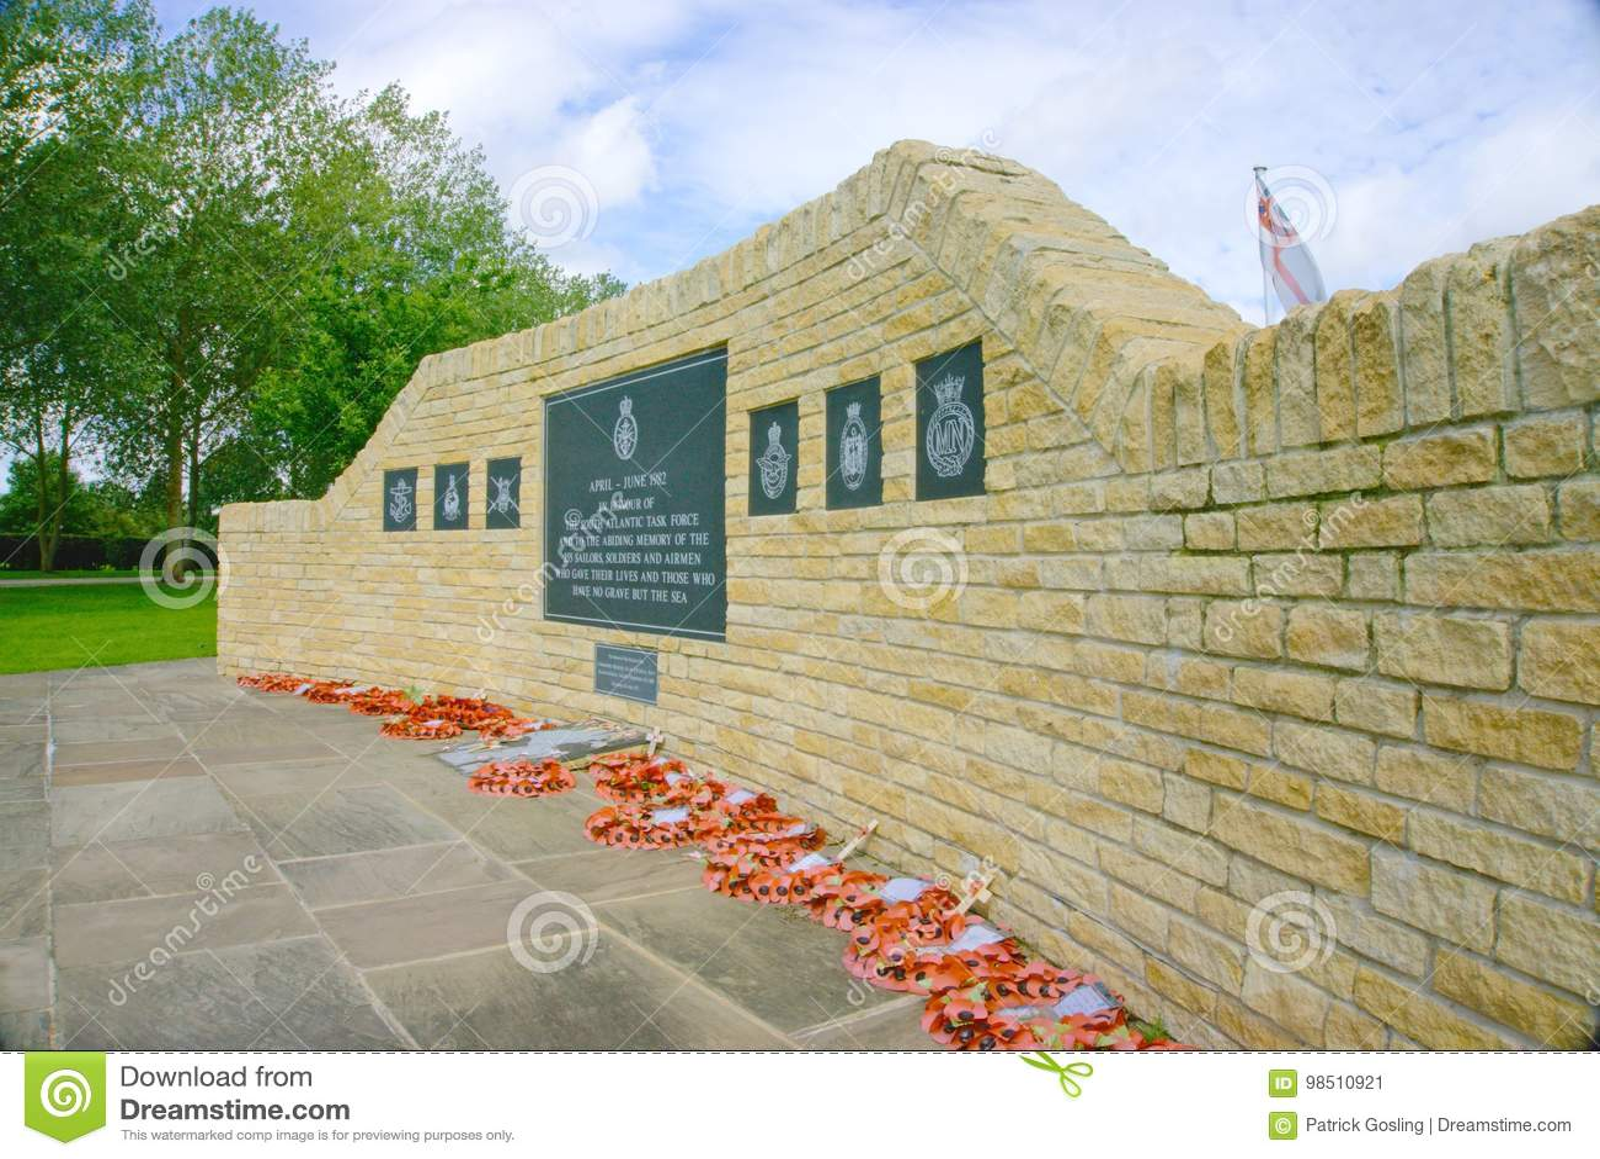 Falkland war memorial.